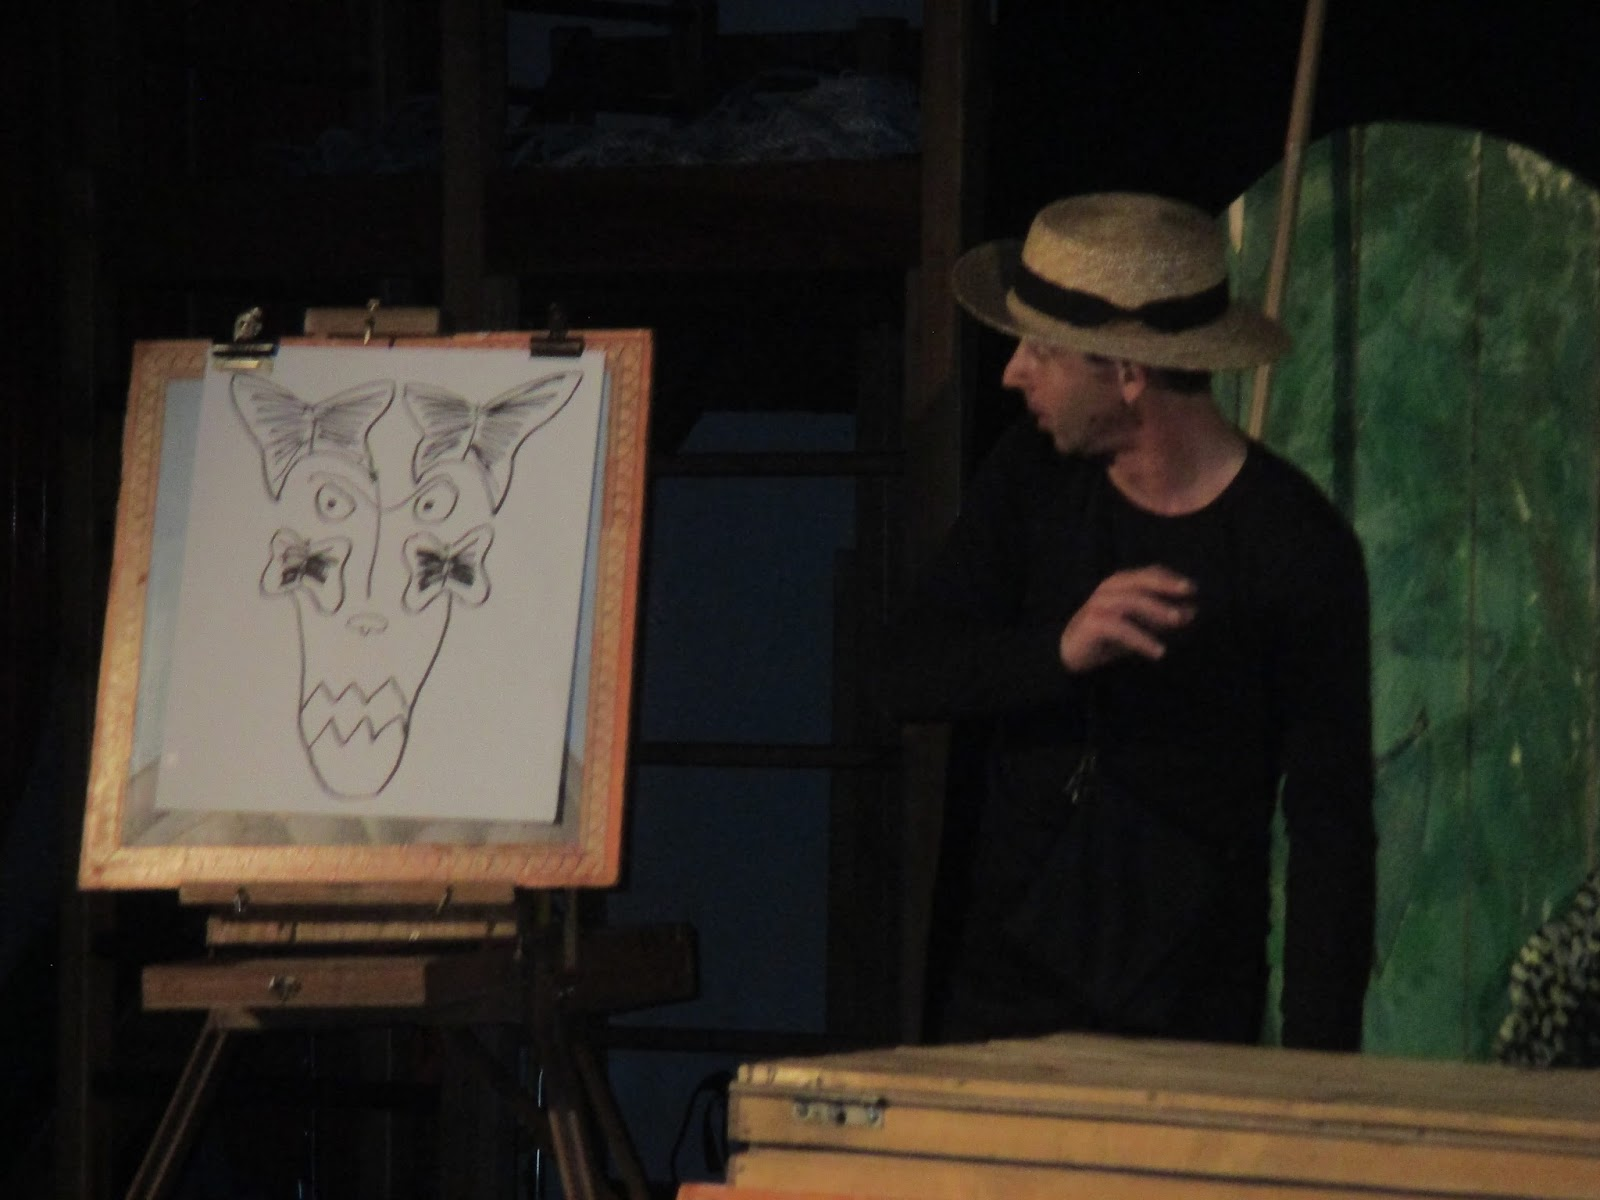 Ecole edouard manceau de rai: spectacle mademoiselle vermillon